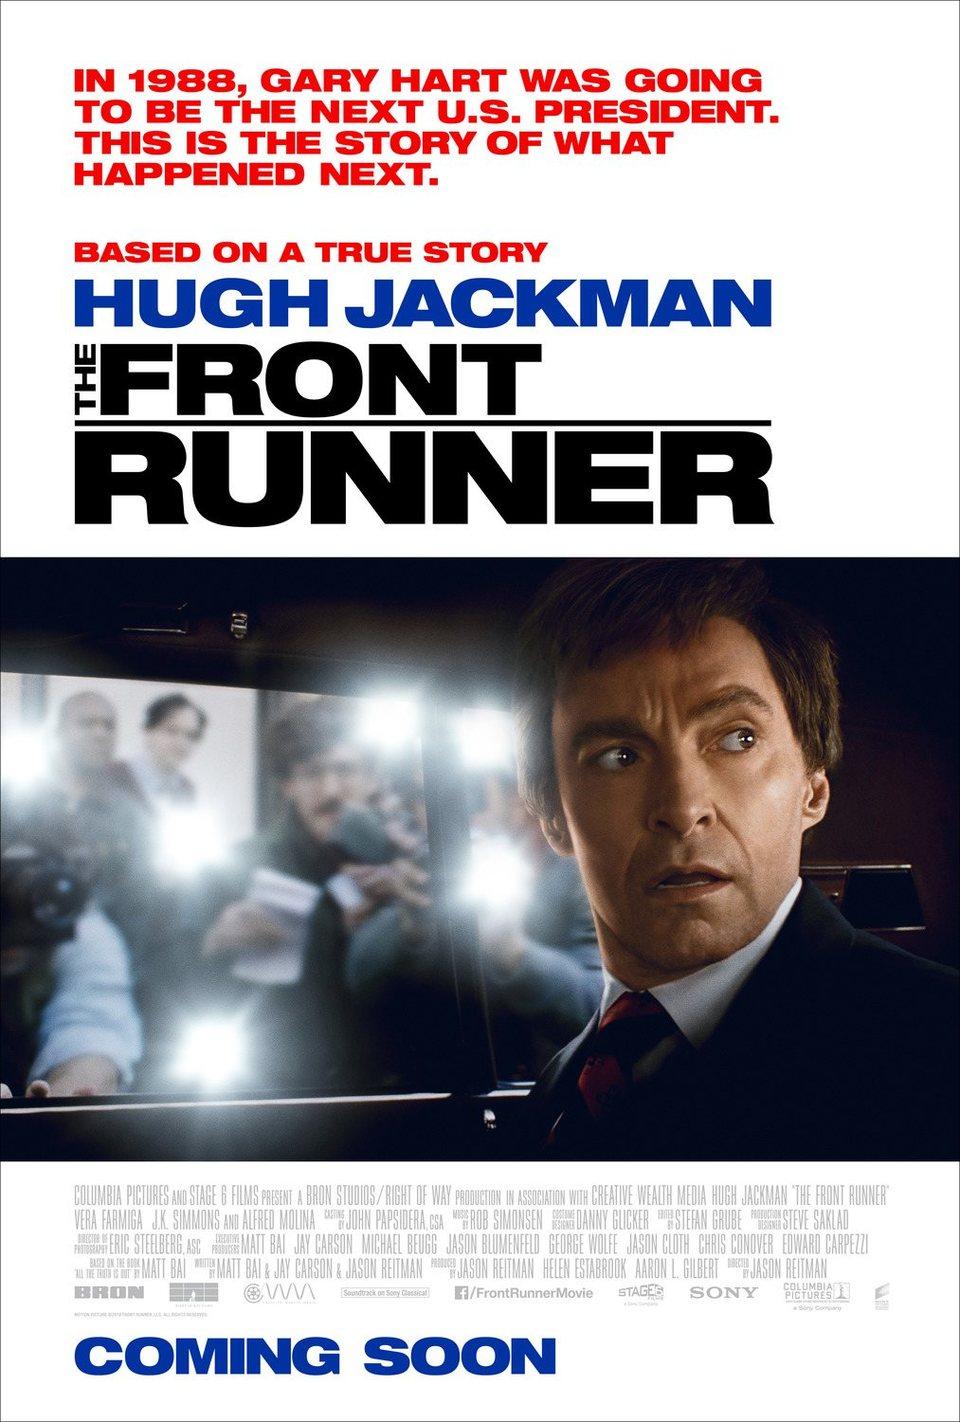 THE FRONT RUNNER #2 poster for The Front Runner